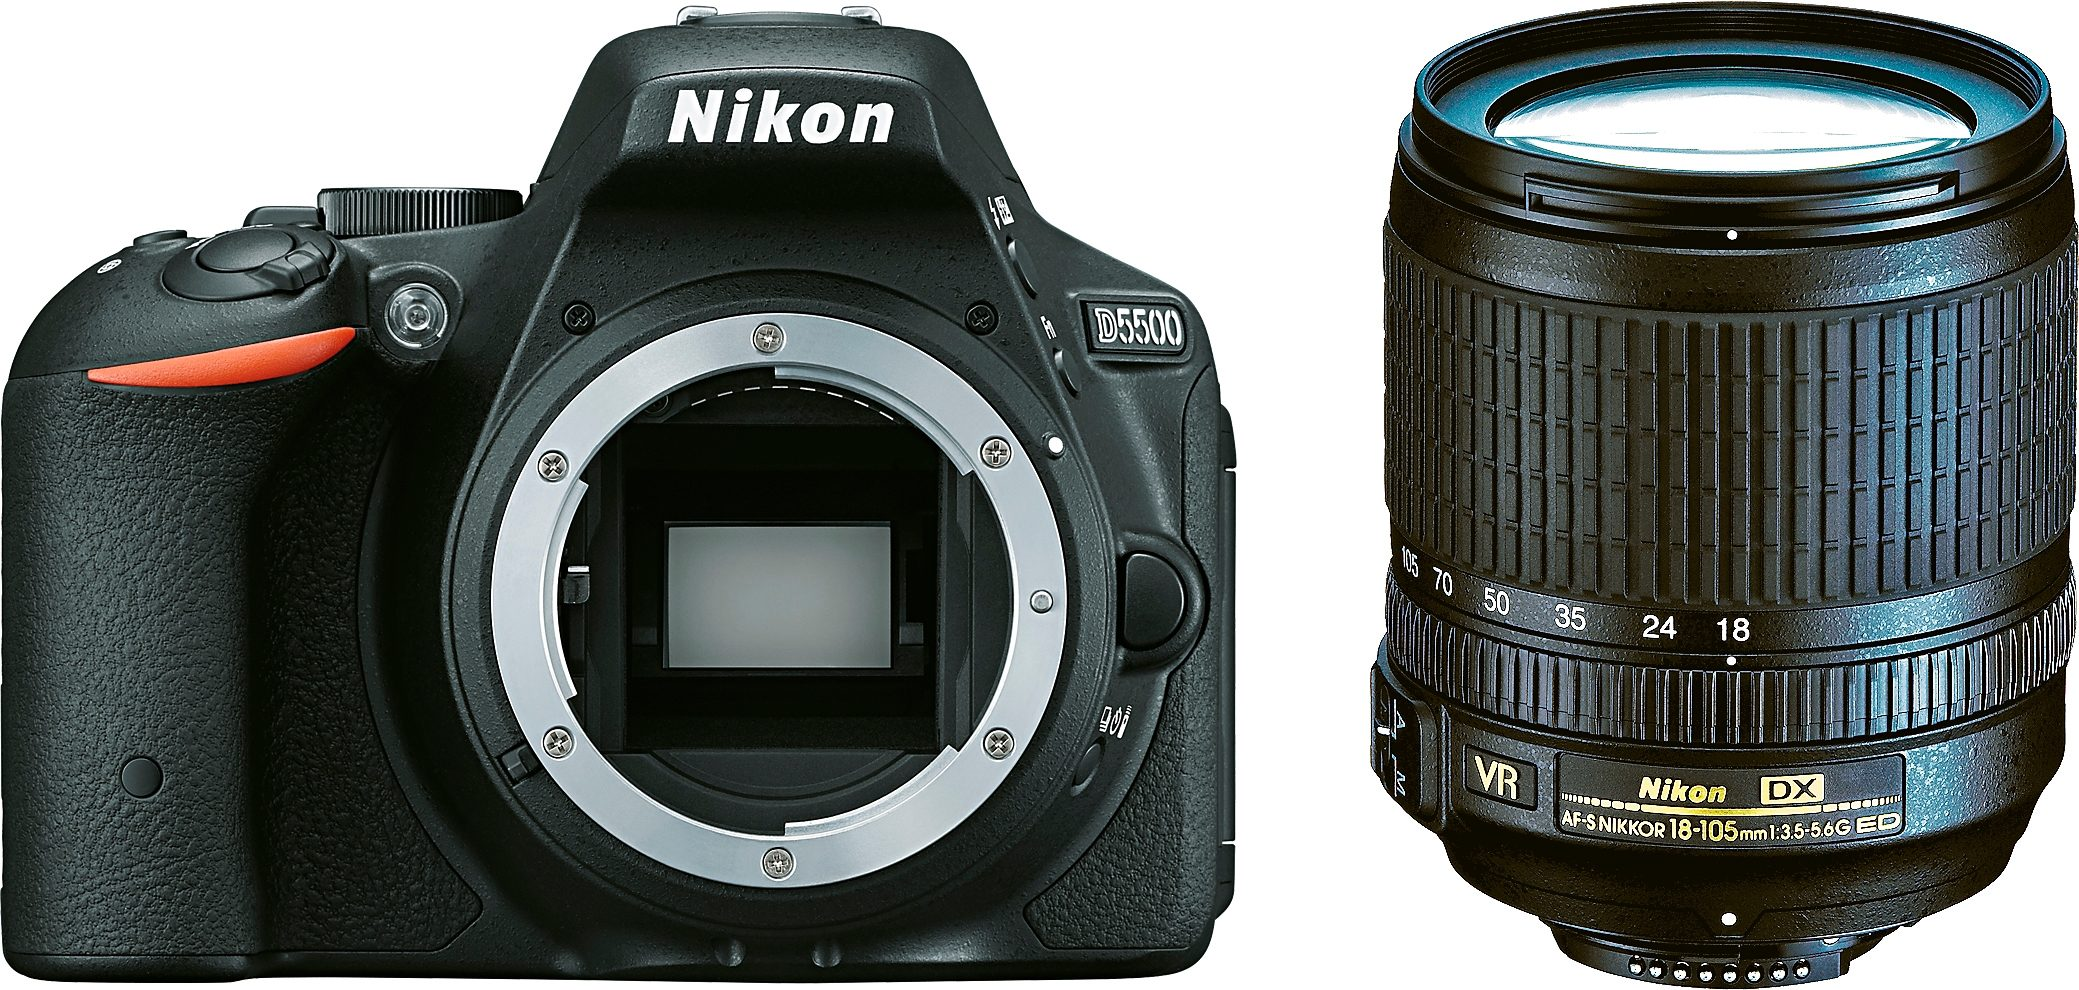 Nikon D5500 Kit DX 18-105 VR Spiegelreflex Kamera, Zoomobjektiv Zoom, 24,2 Megapixel